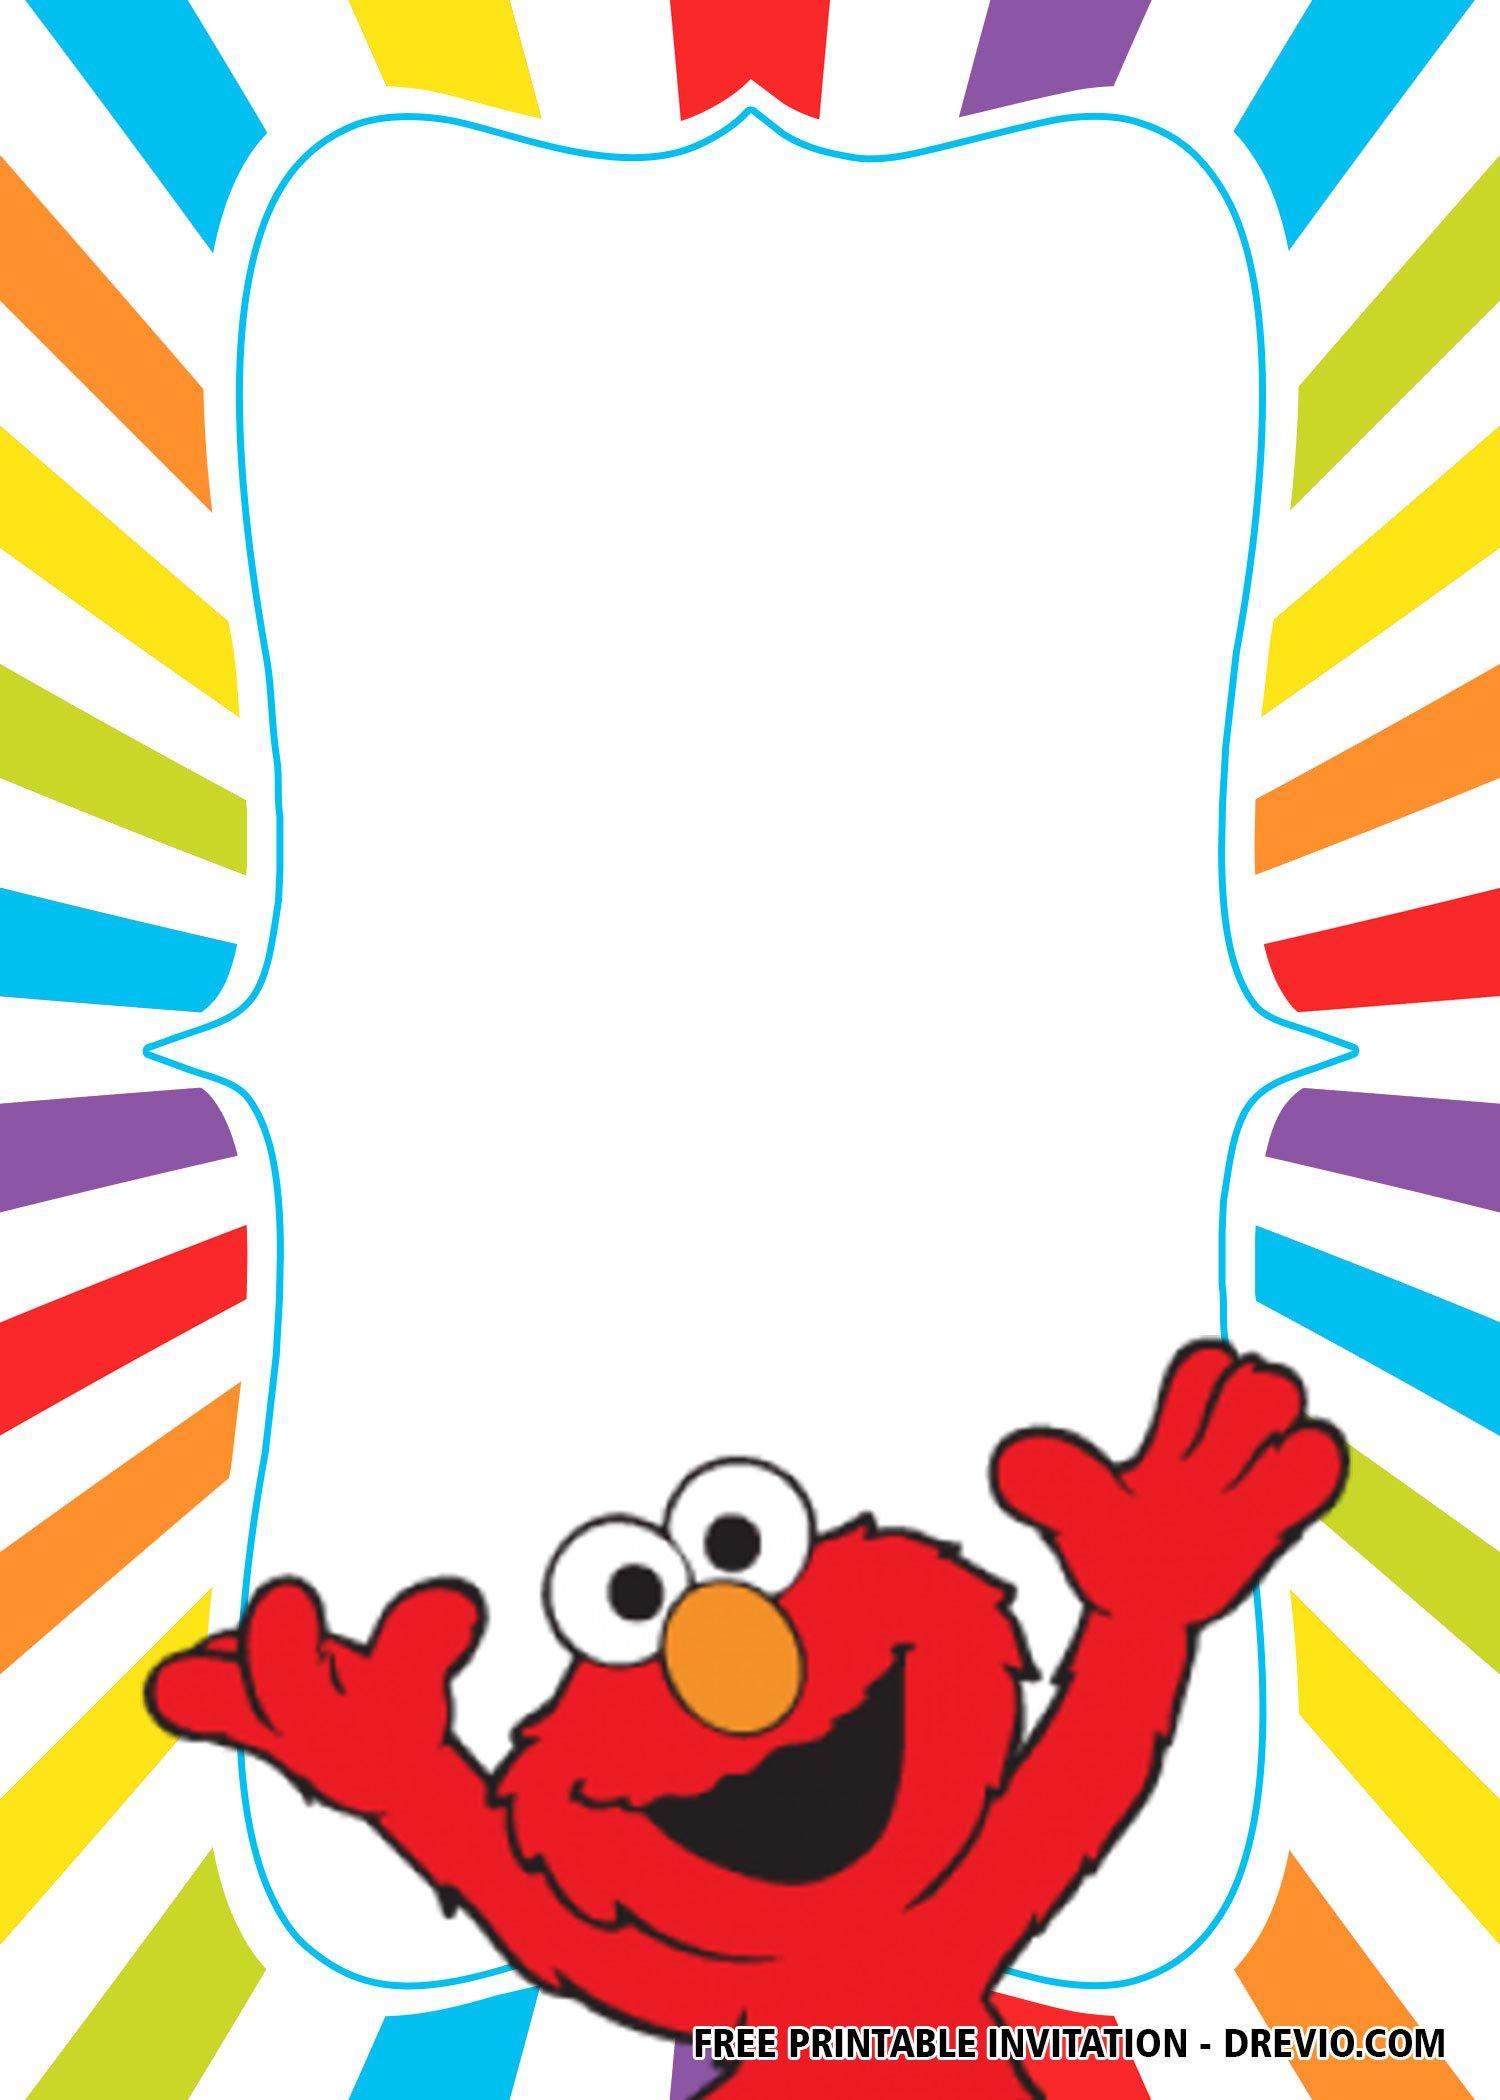 Free Elmo Birthday Invitation Templates Download Hundreds Free Printable Birthday Invitation Templates